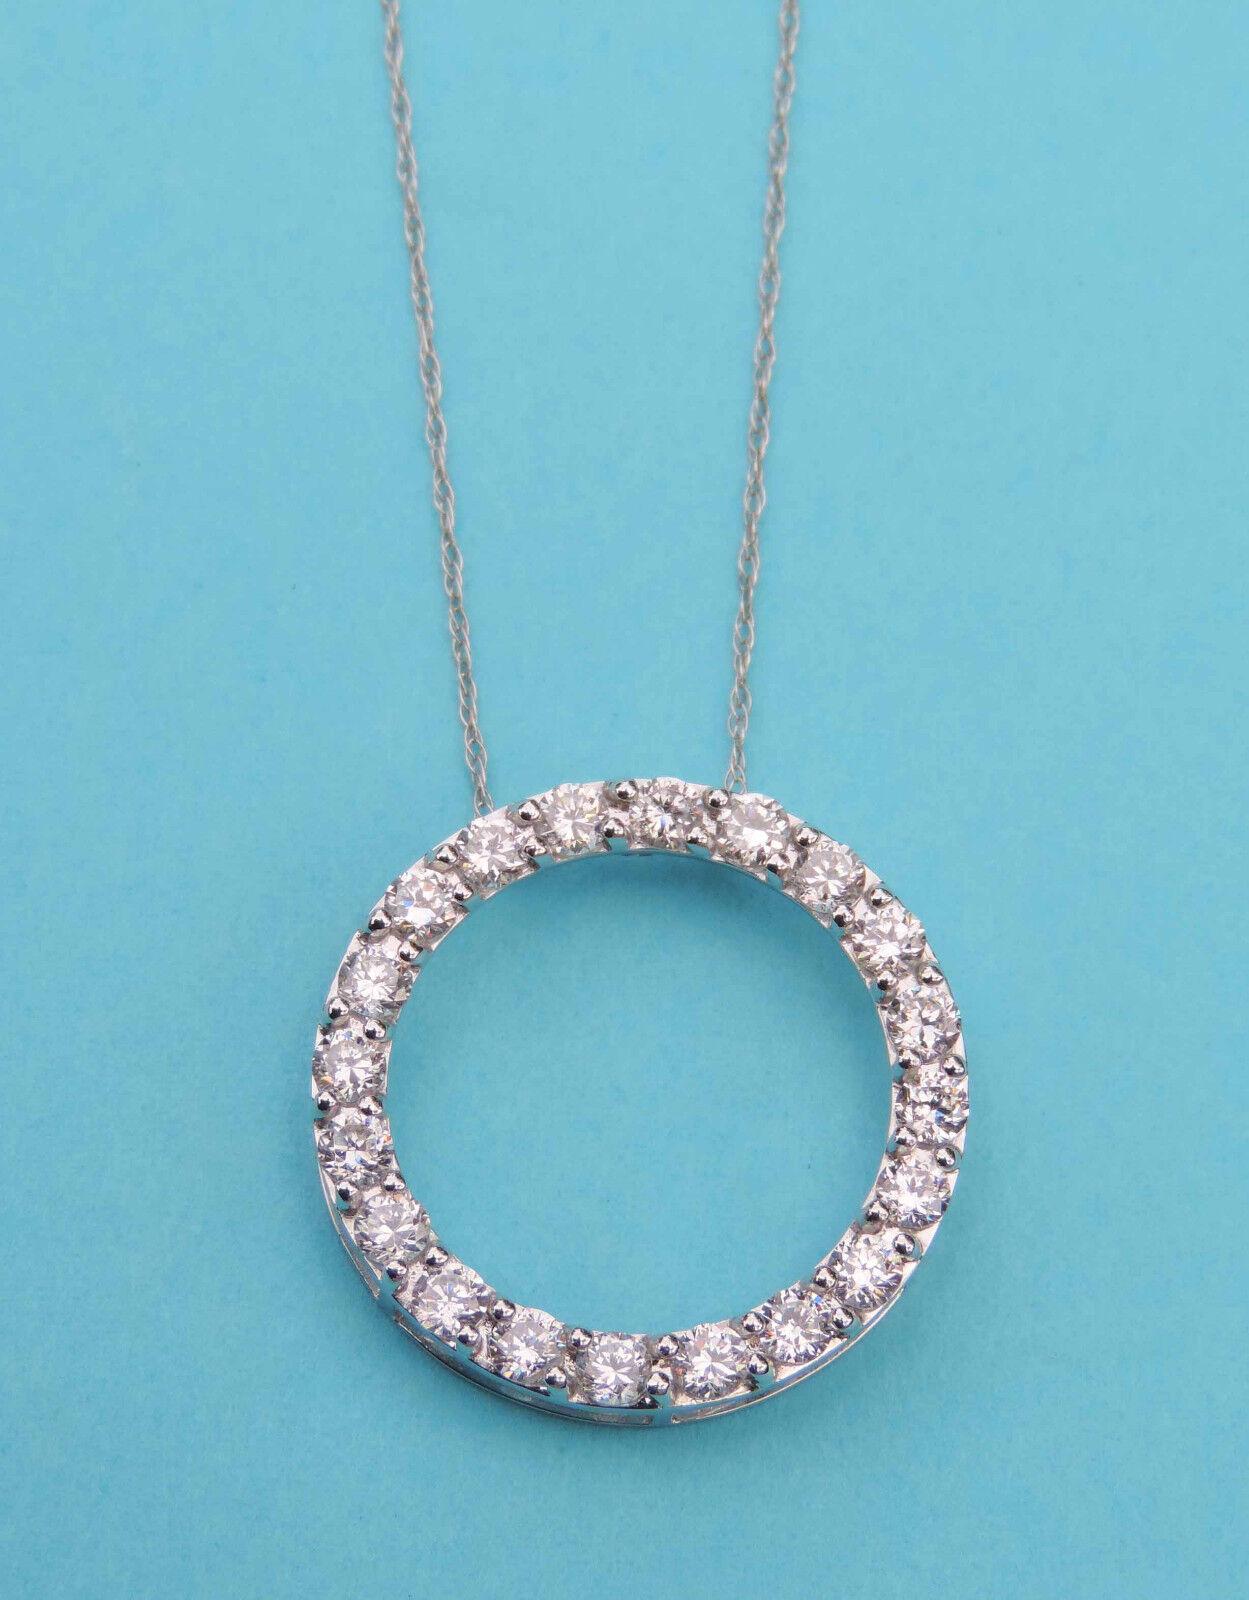 Ladies Circle Pendant w  20 Man-Made White Diamonds - 10K White gold Chain